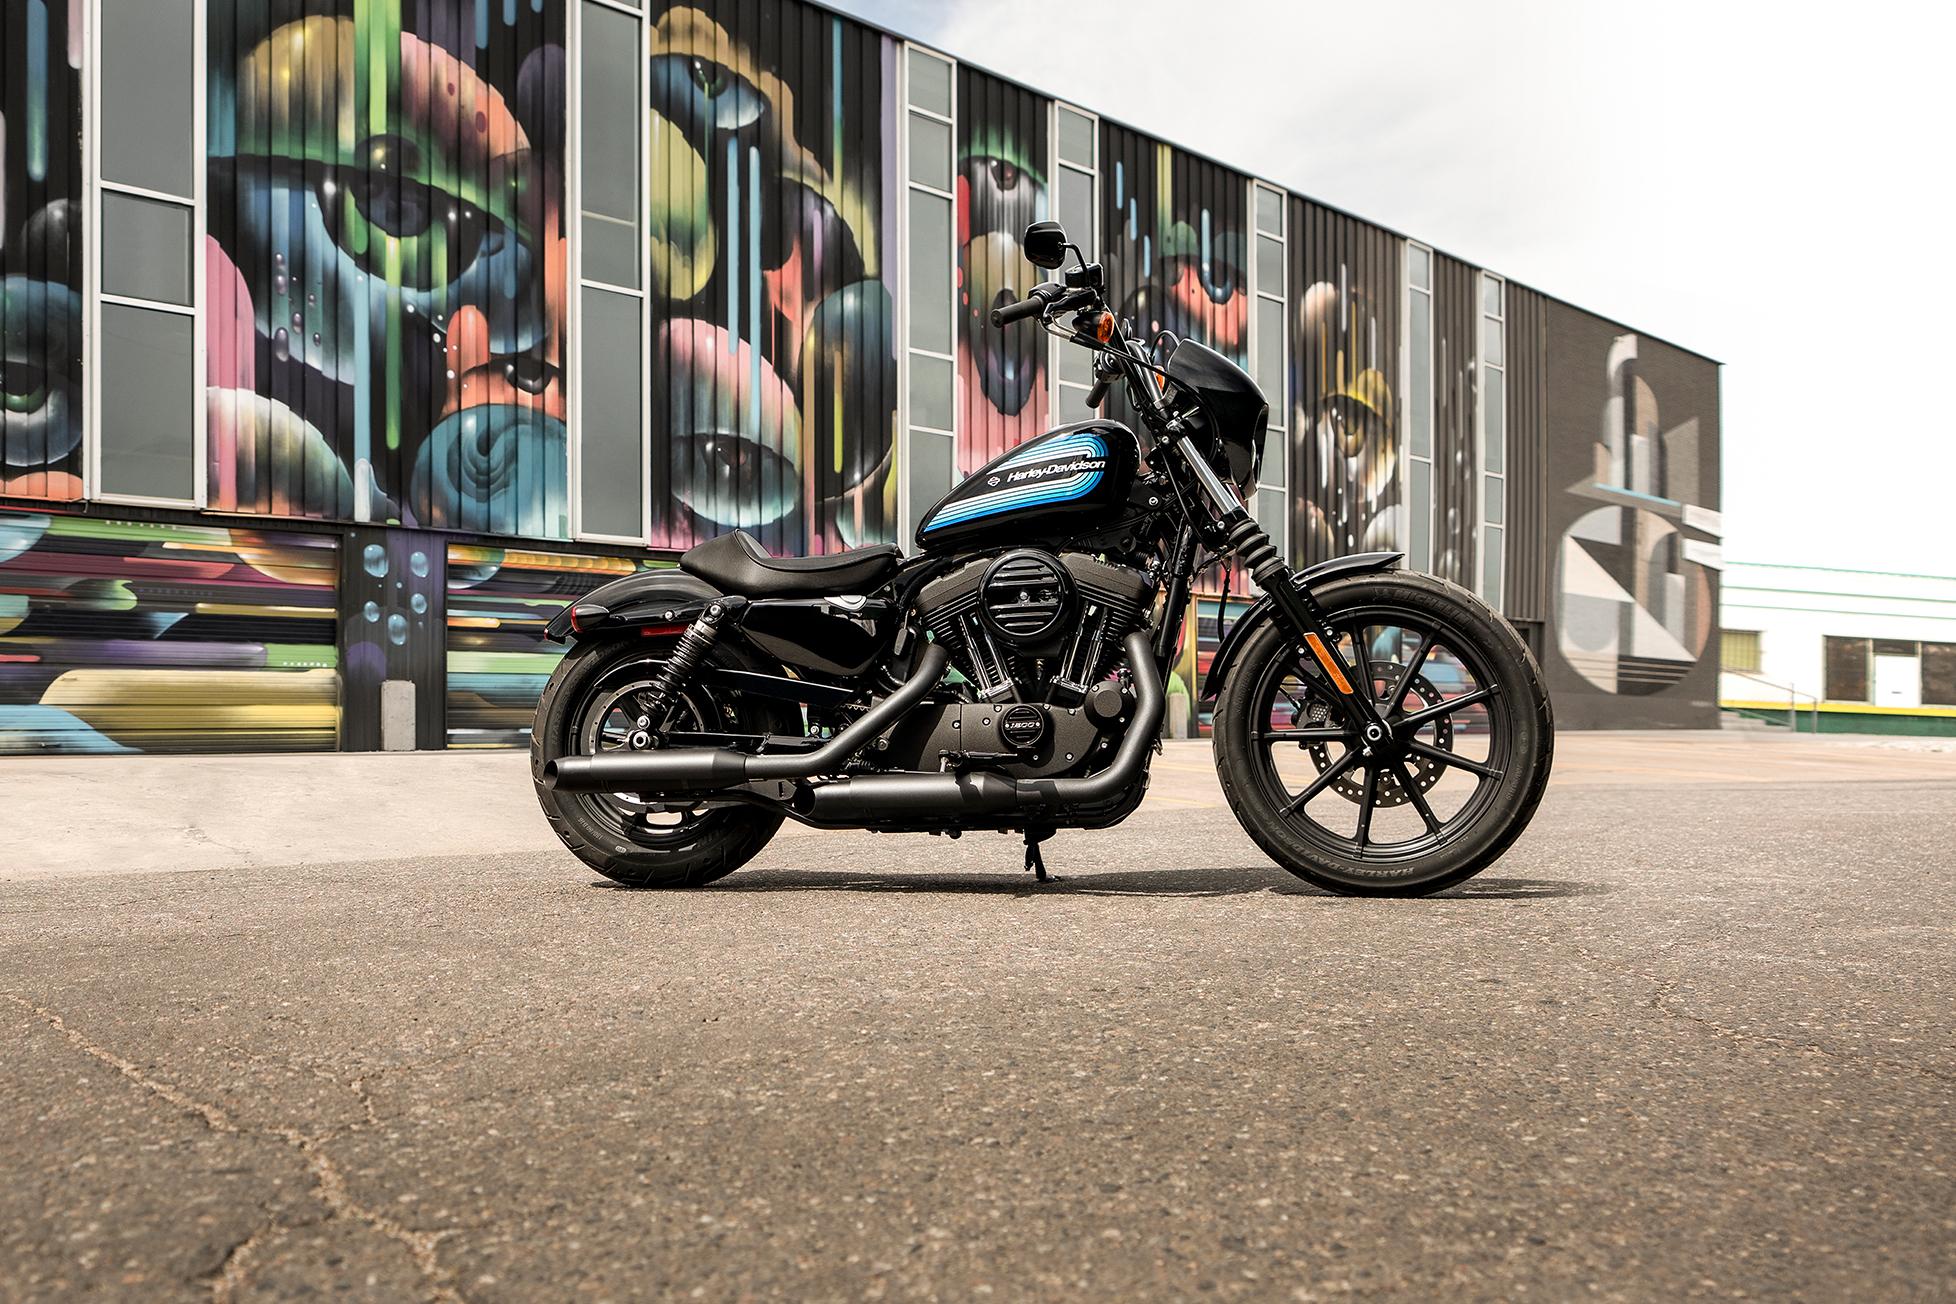 2020 Iron 1200 Motorcycle Specs & Pricing | Harley-Davidson USA